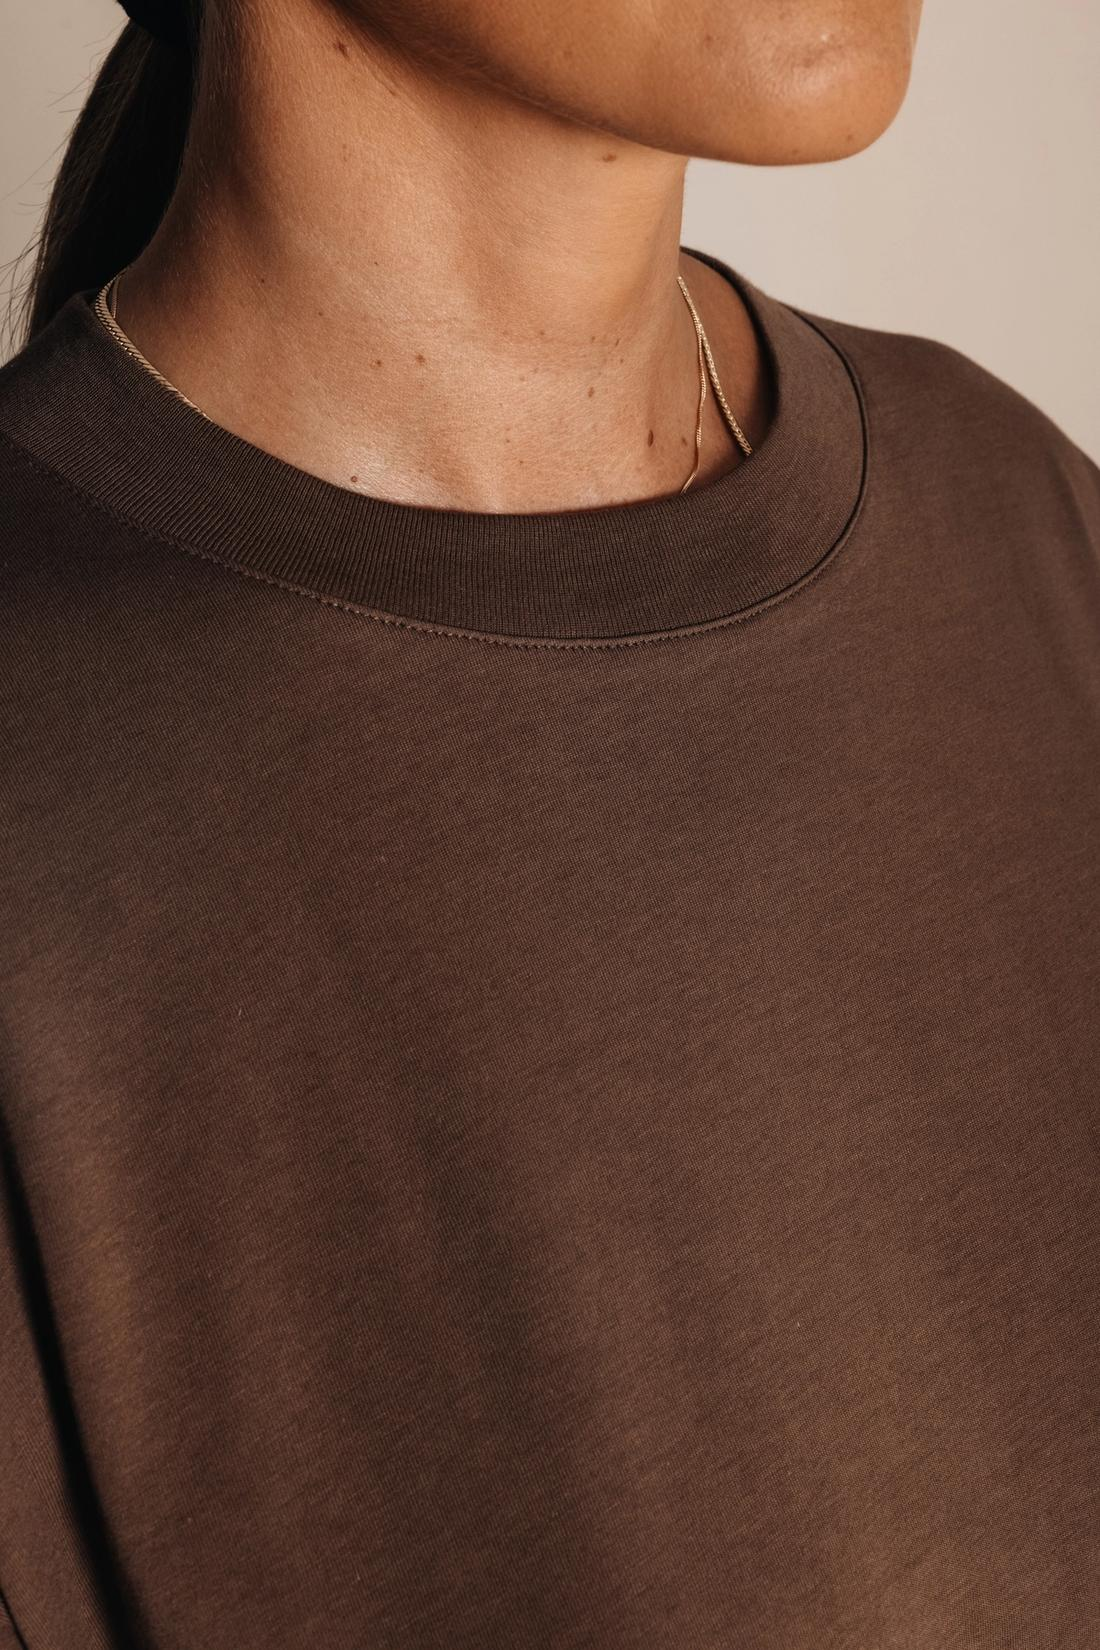 The Oversized T-Shirt